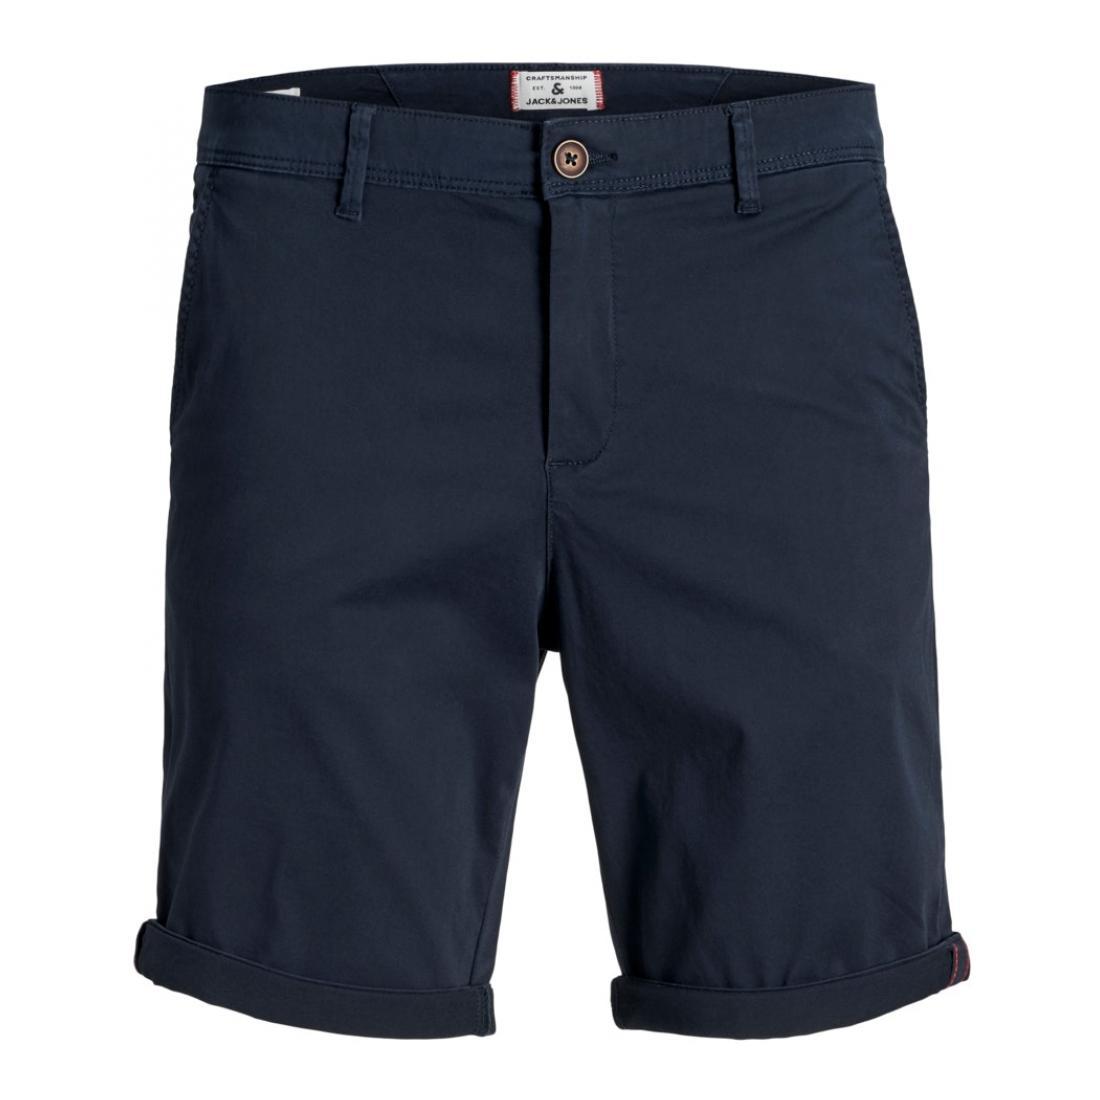 Jack & Jones Bermuda/Shorts Damen JJIBOWIE JJSHORTS SOLID S